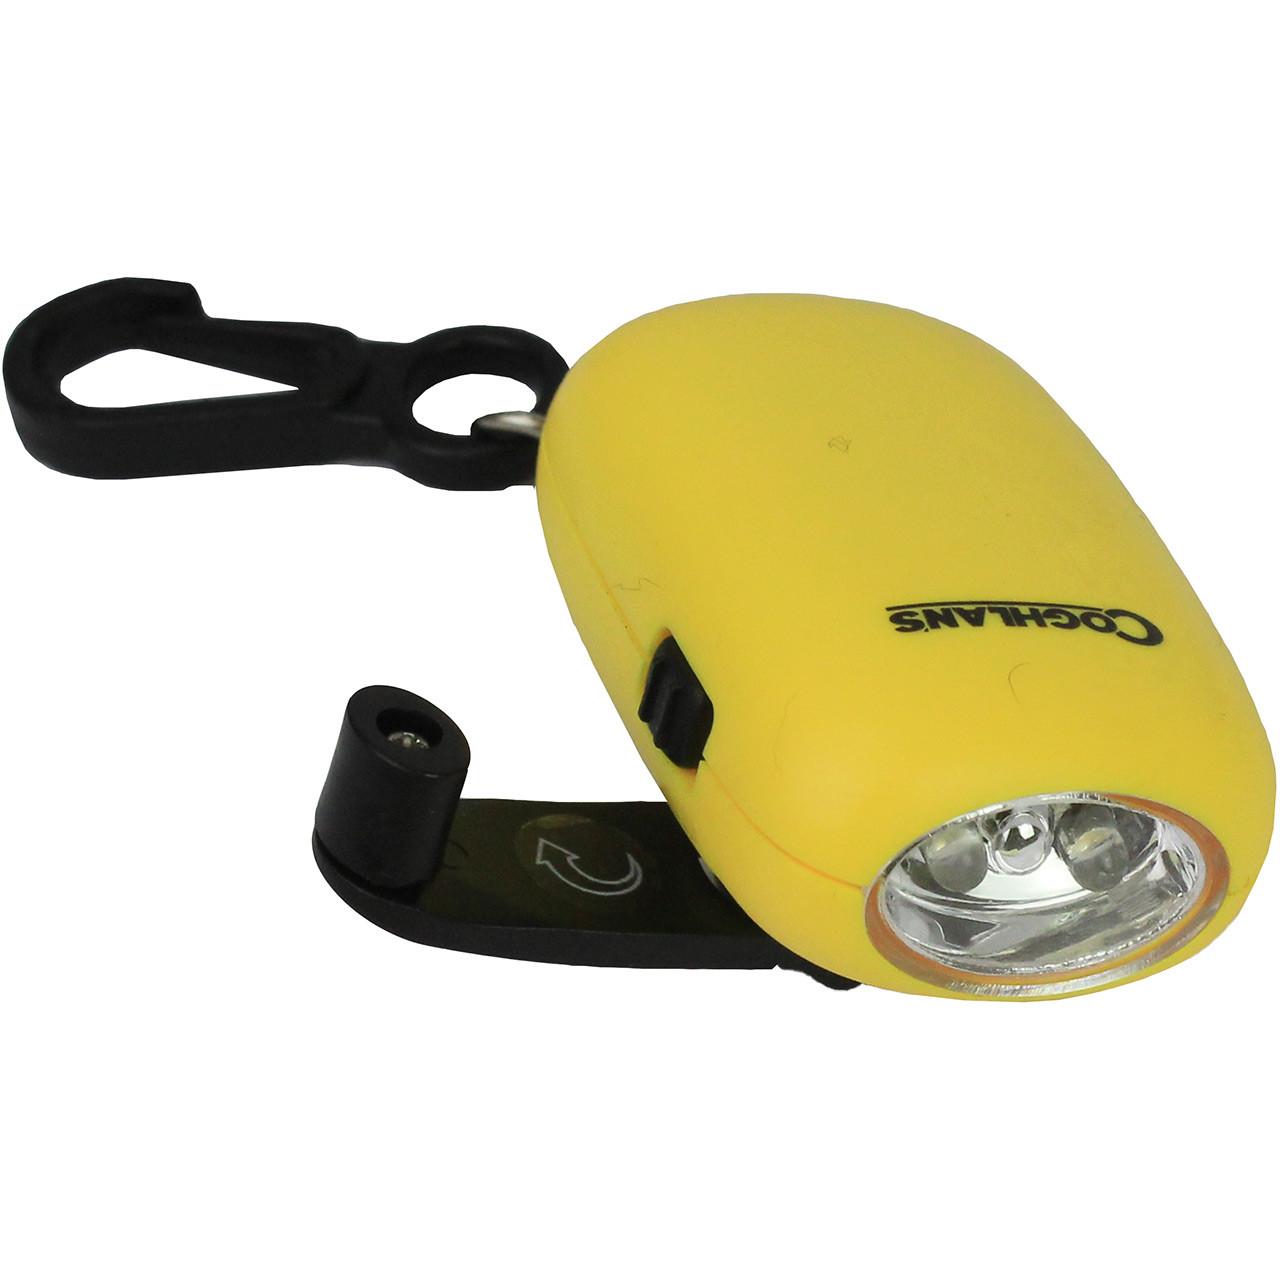 Dynamo Hand Crank Flashlight